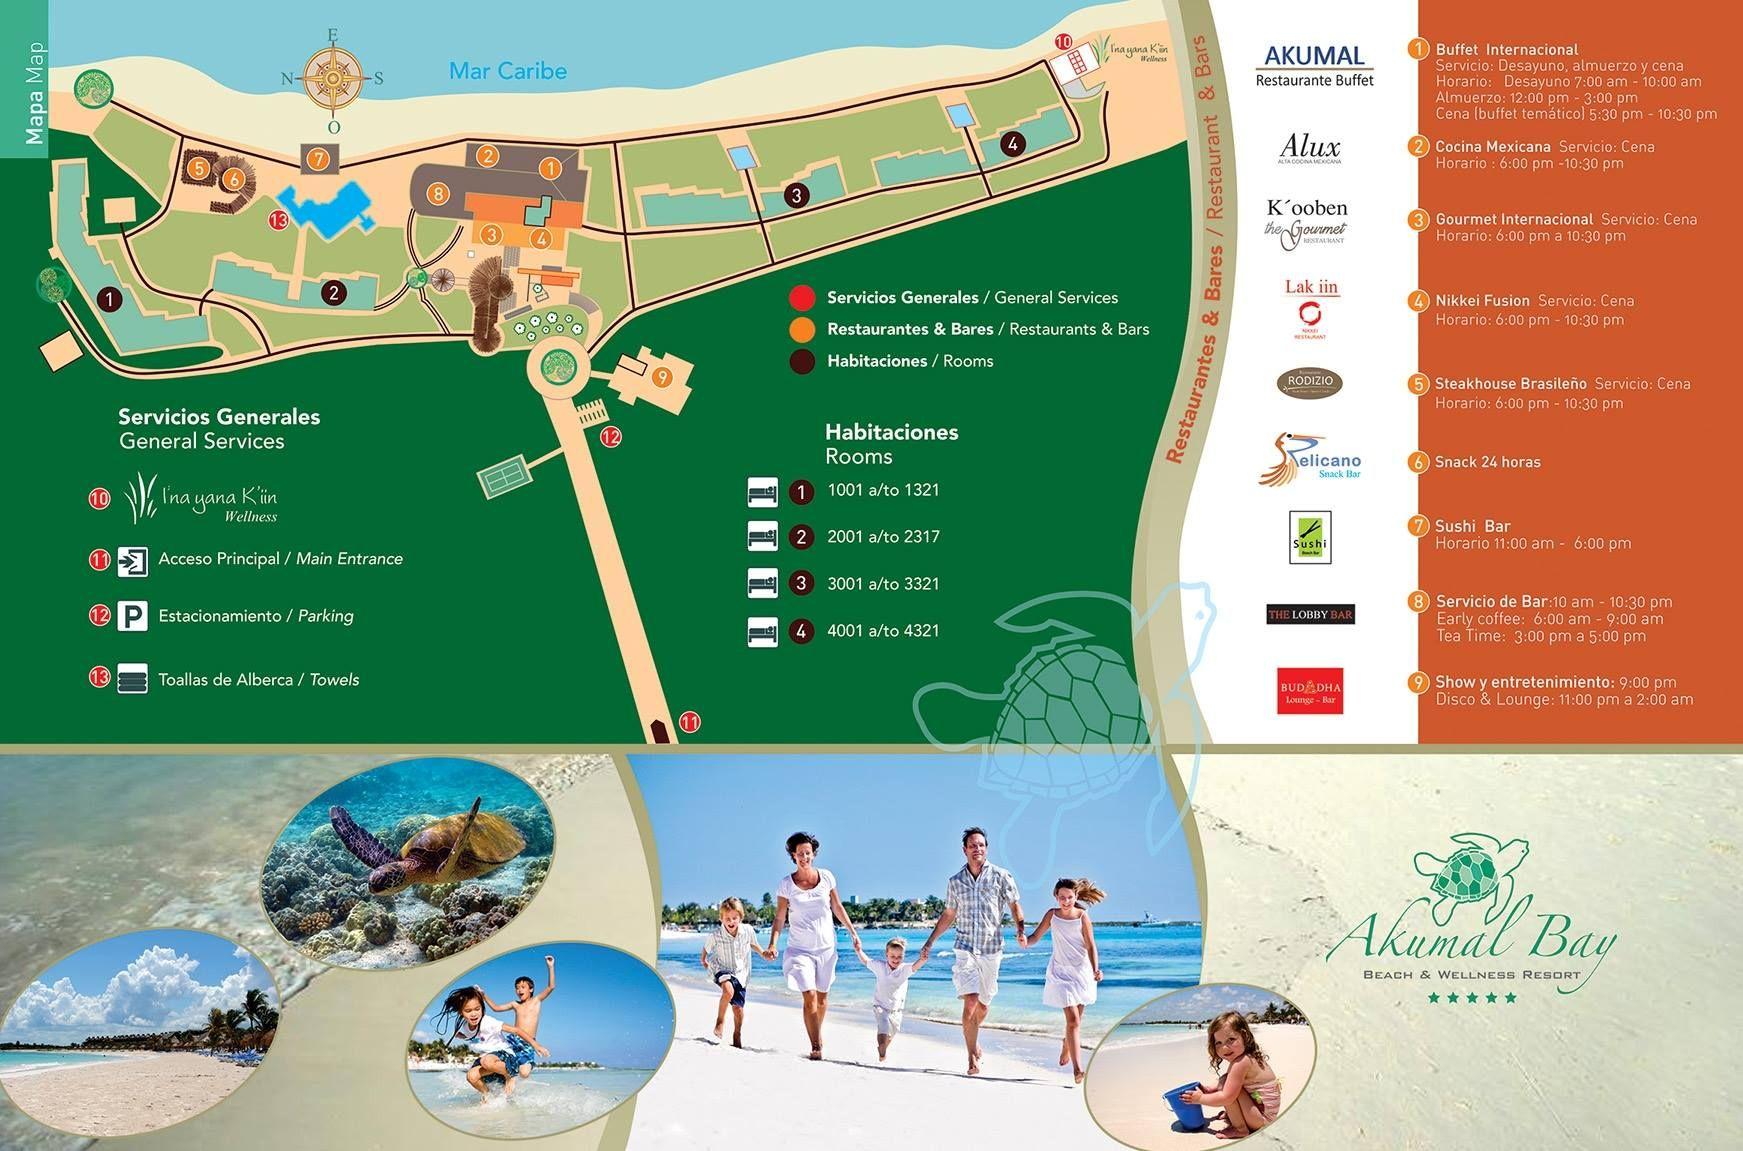 Best 25 Akumal Bay Resort Ideas On Pinterest Akumal